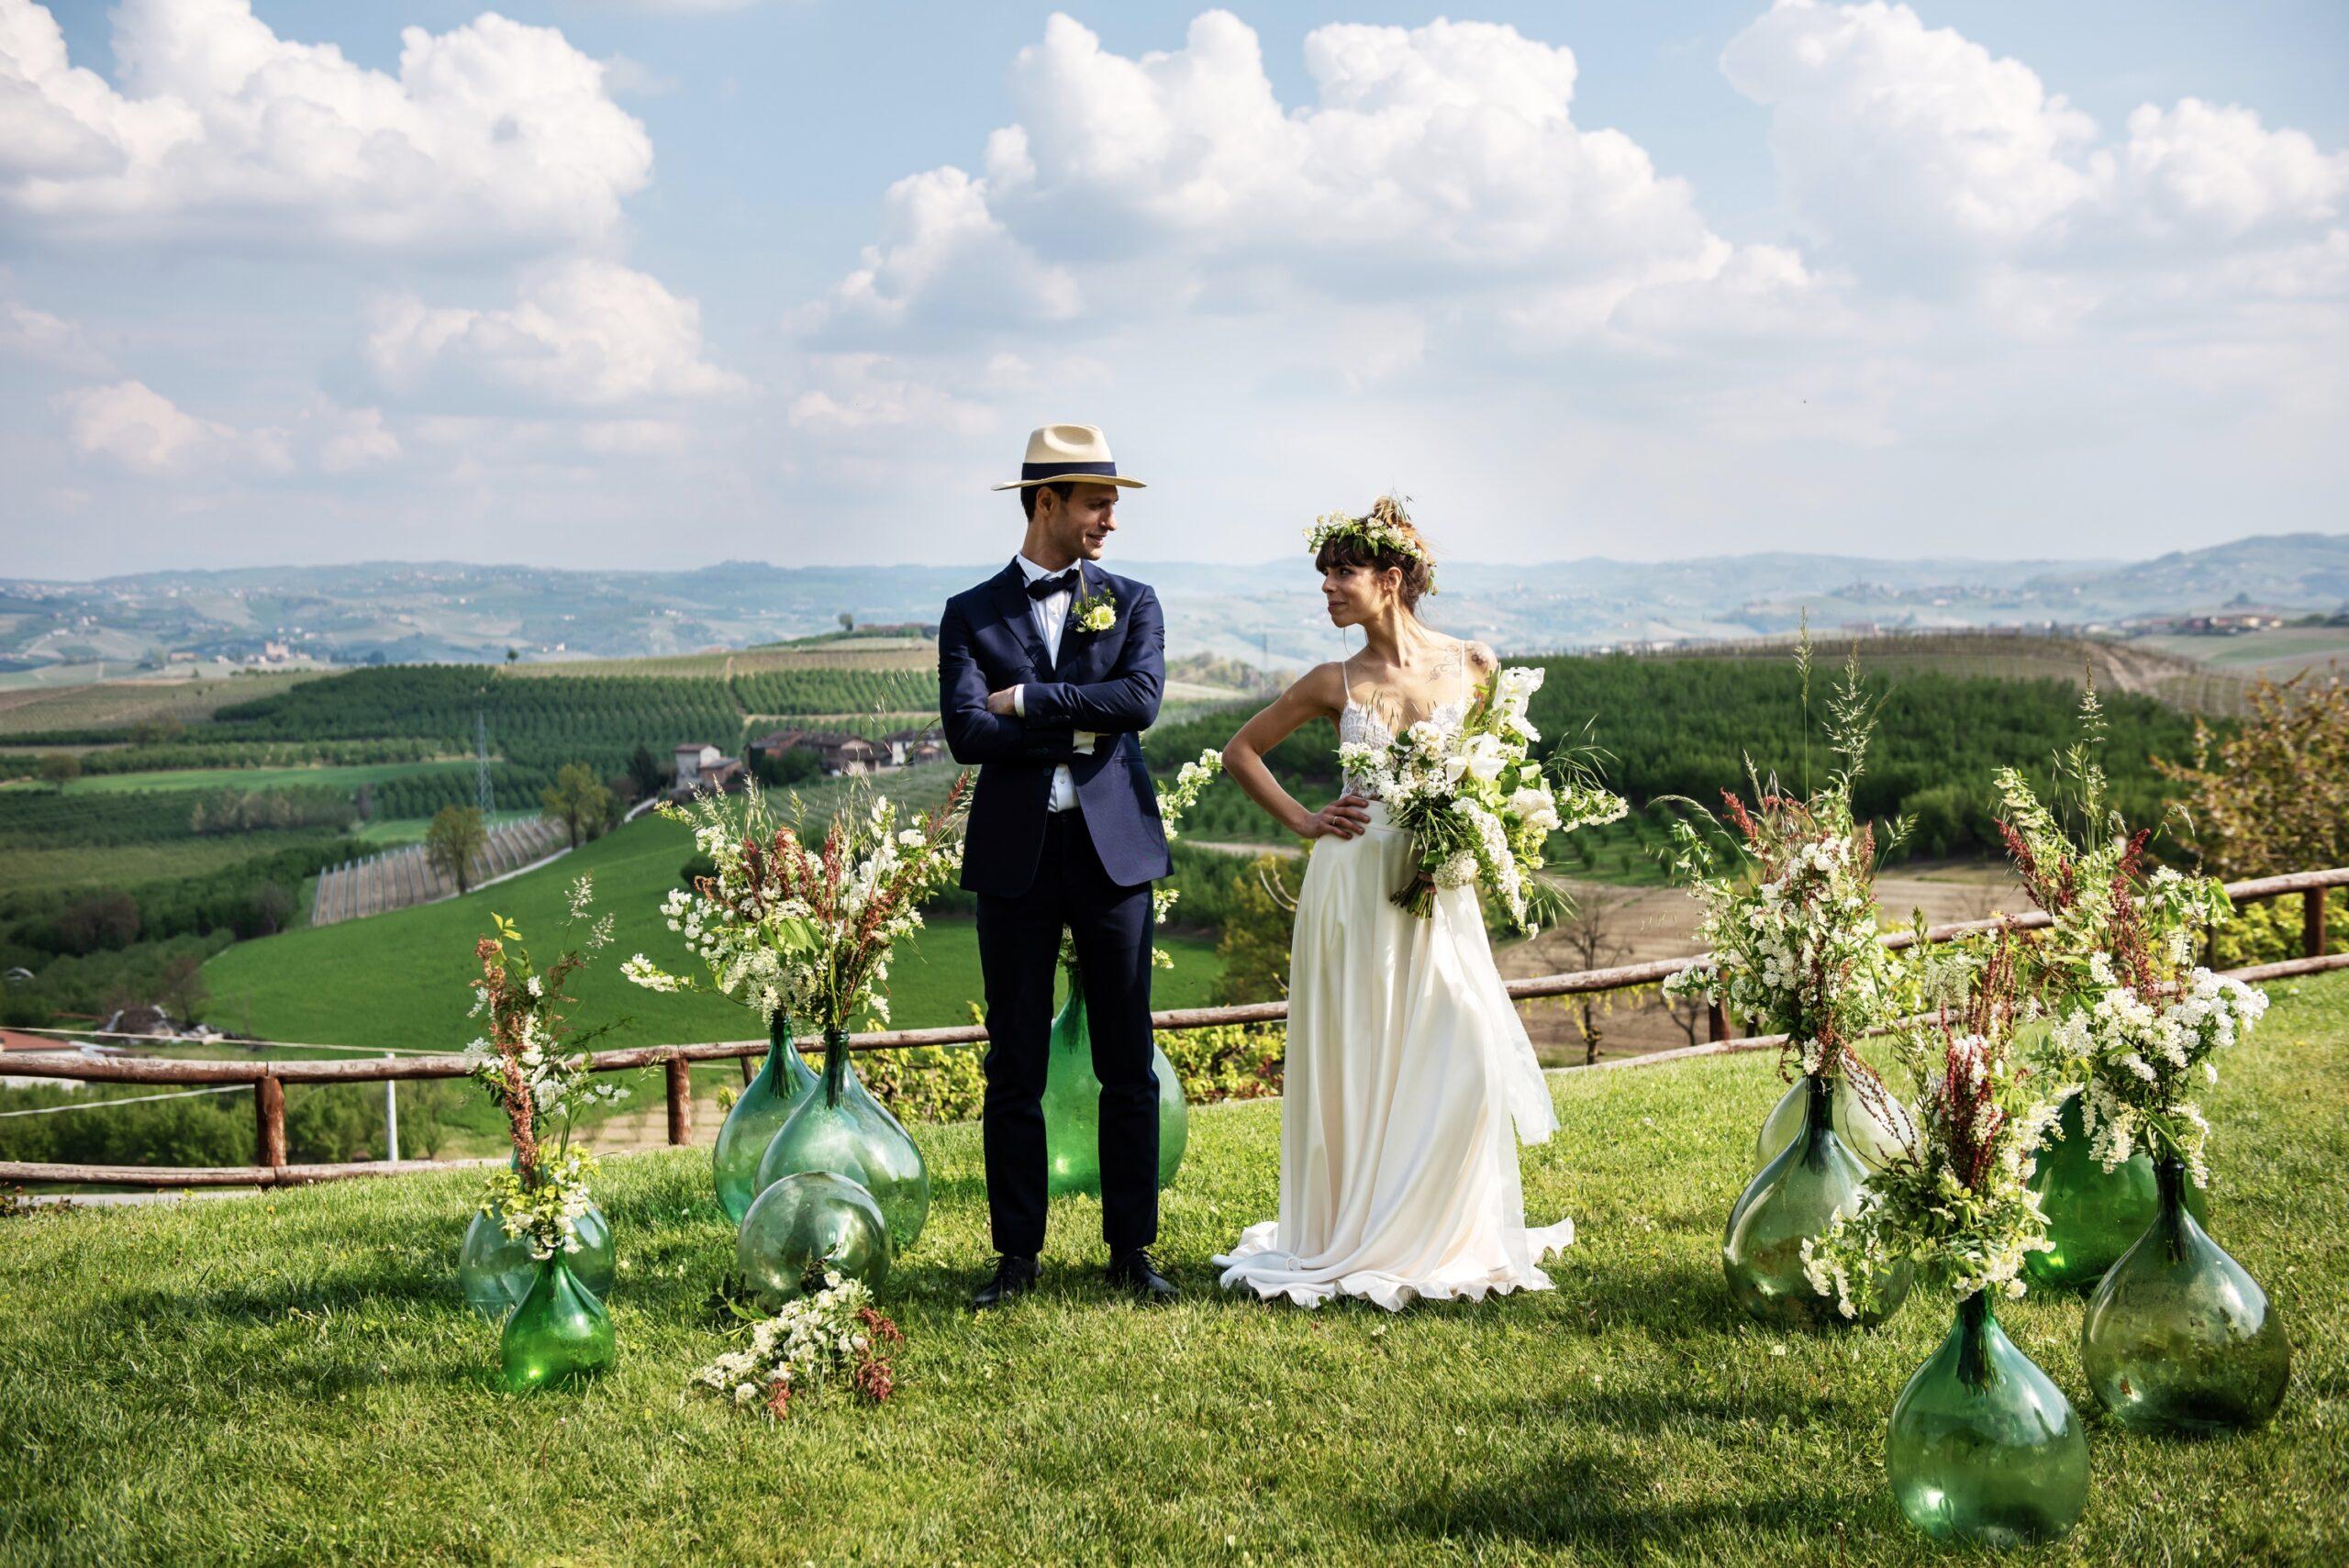 https://www.nanaweddingevents.com/wp-content/uploads/2021/06/Langhe_Wedding_Italy041-scaled.jpg